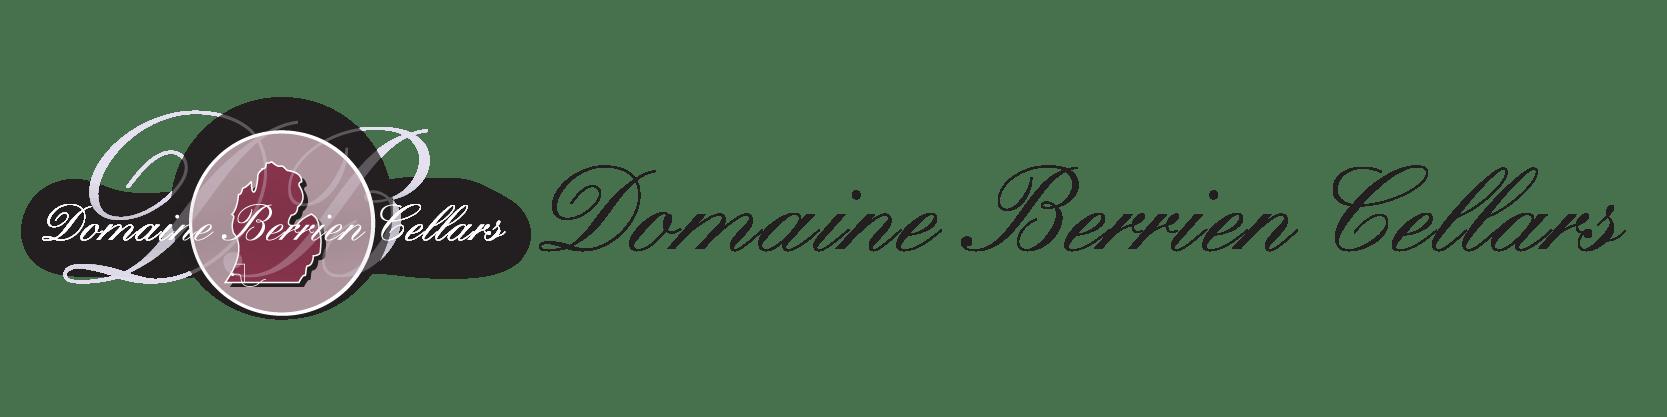 Domaine Berrien Cellars